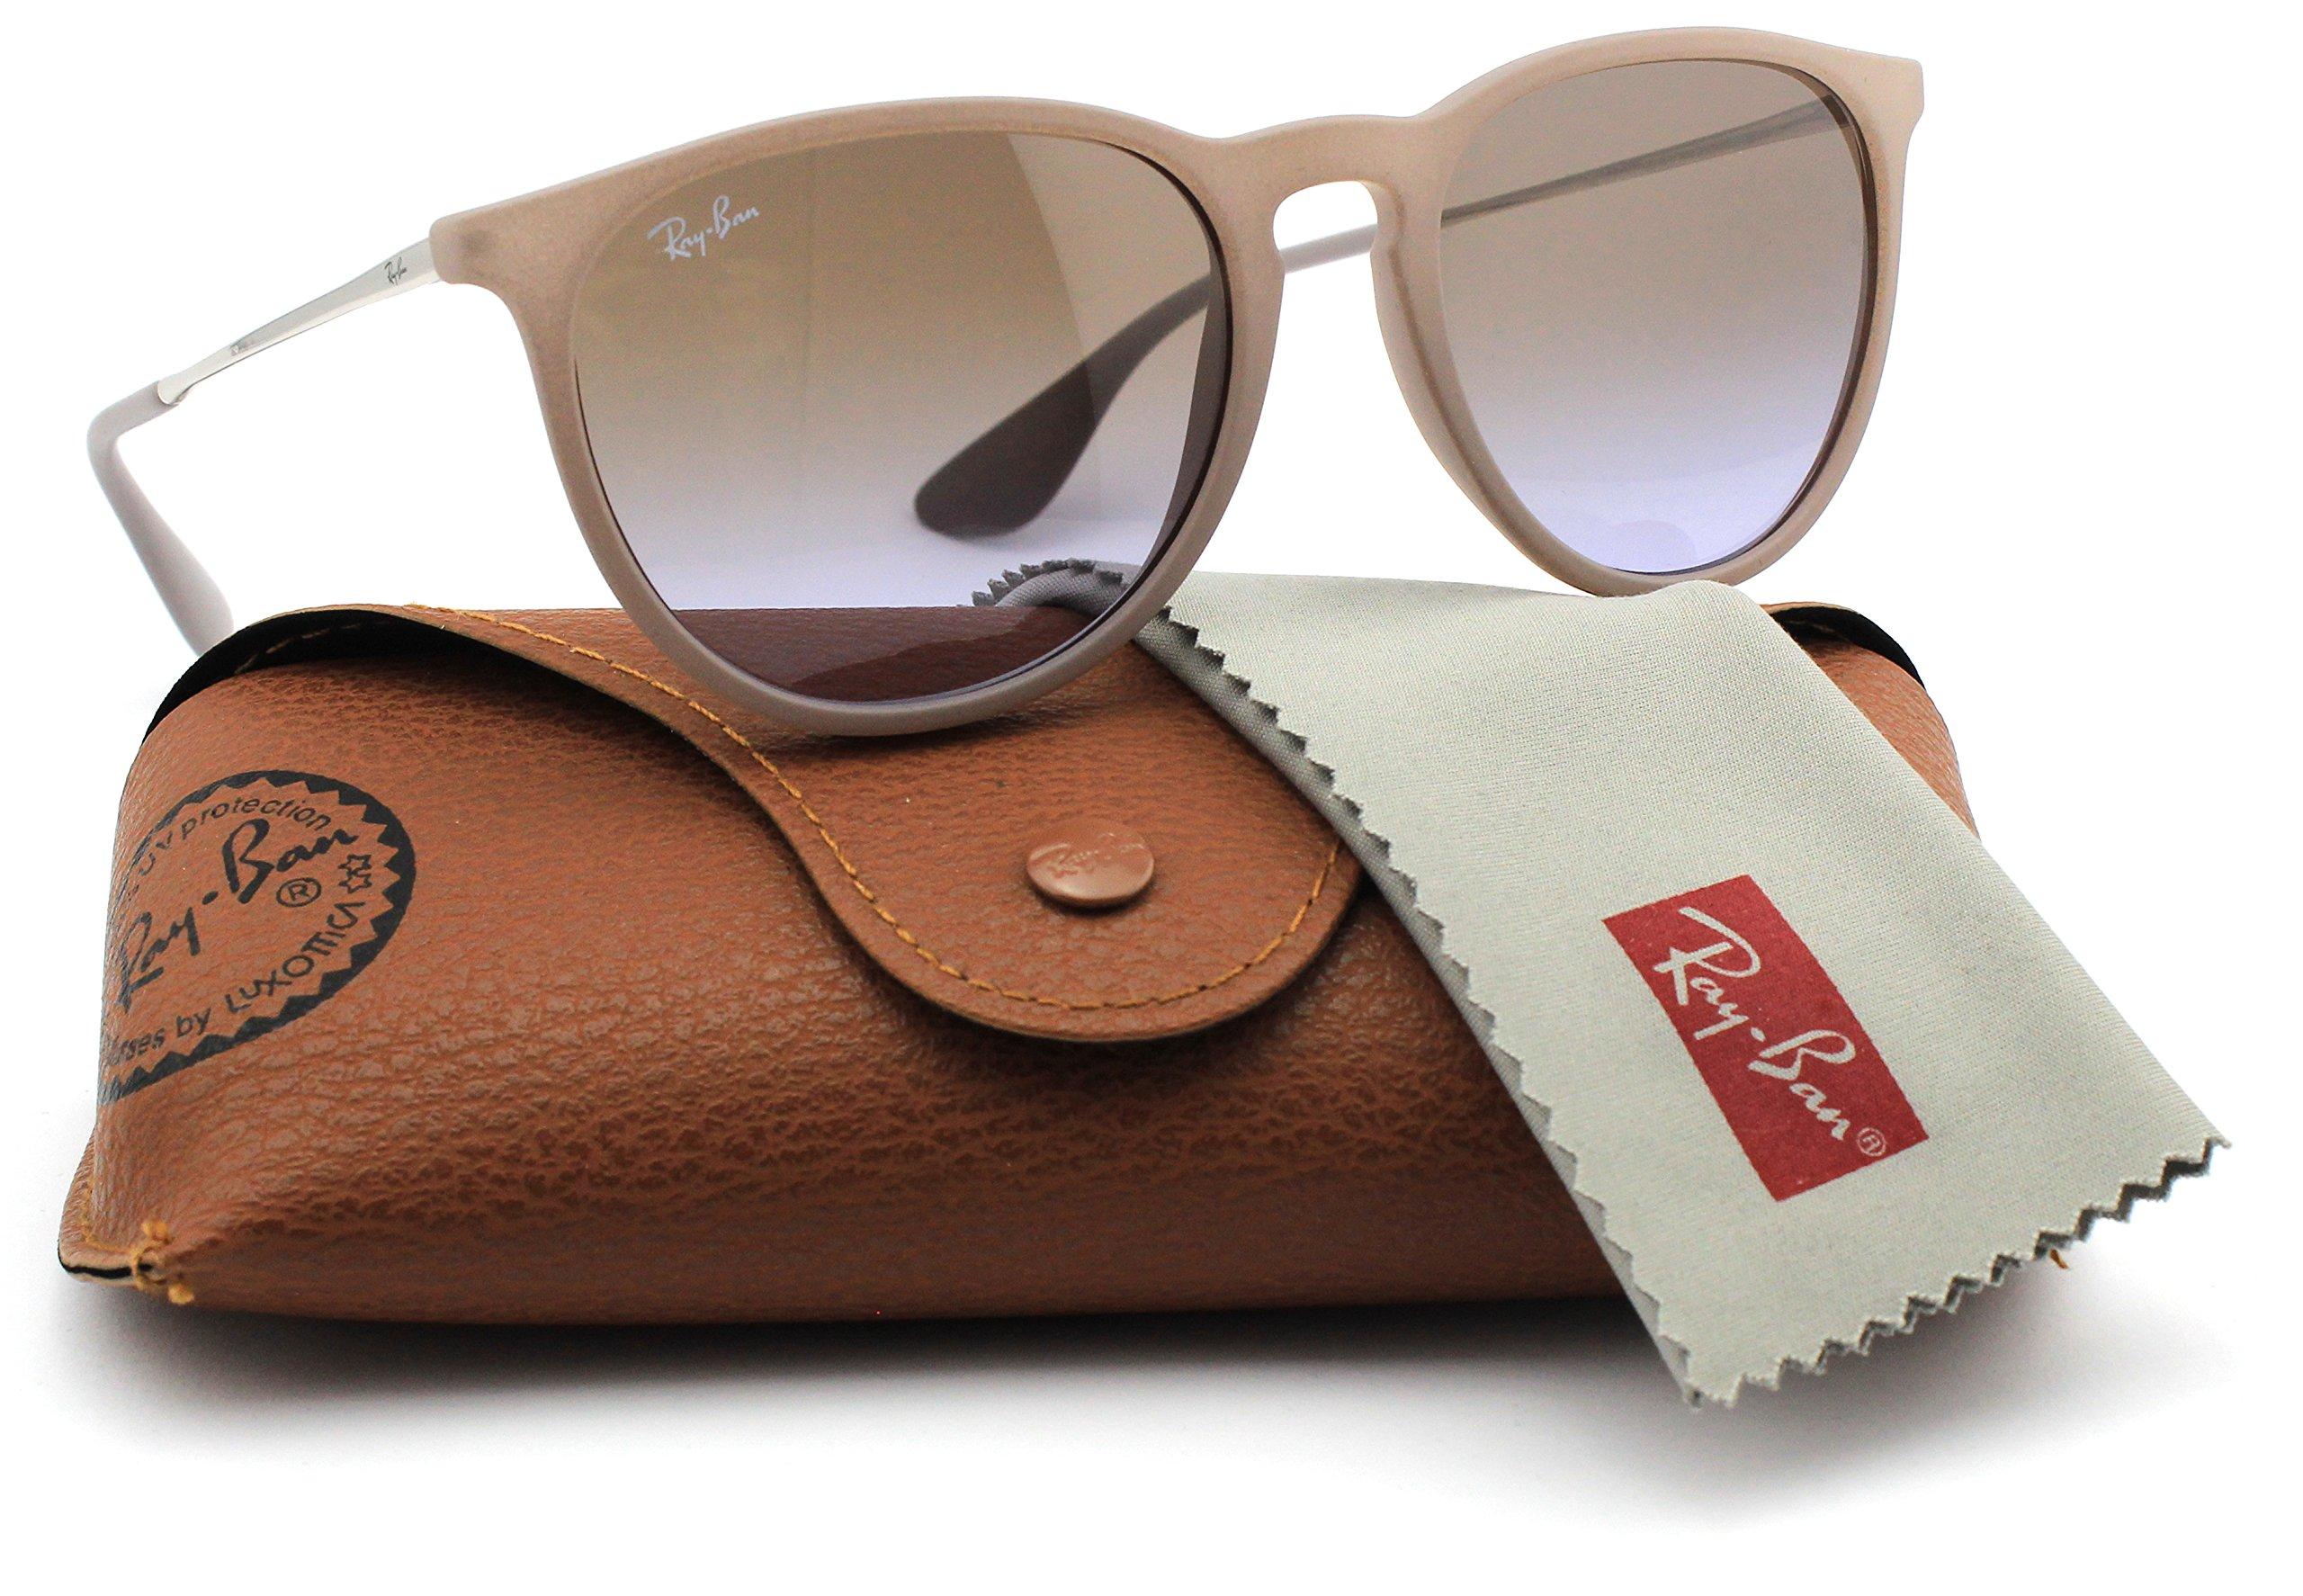 Ray-Ban RB4171 600068 Erica Sunglasses Dark Rubber Sand Frame / Brown Gradient Lens